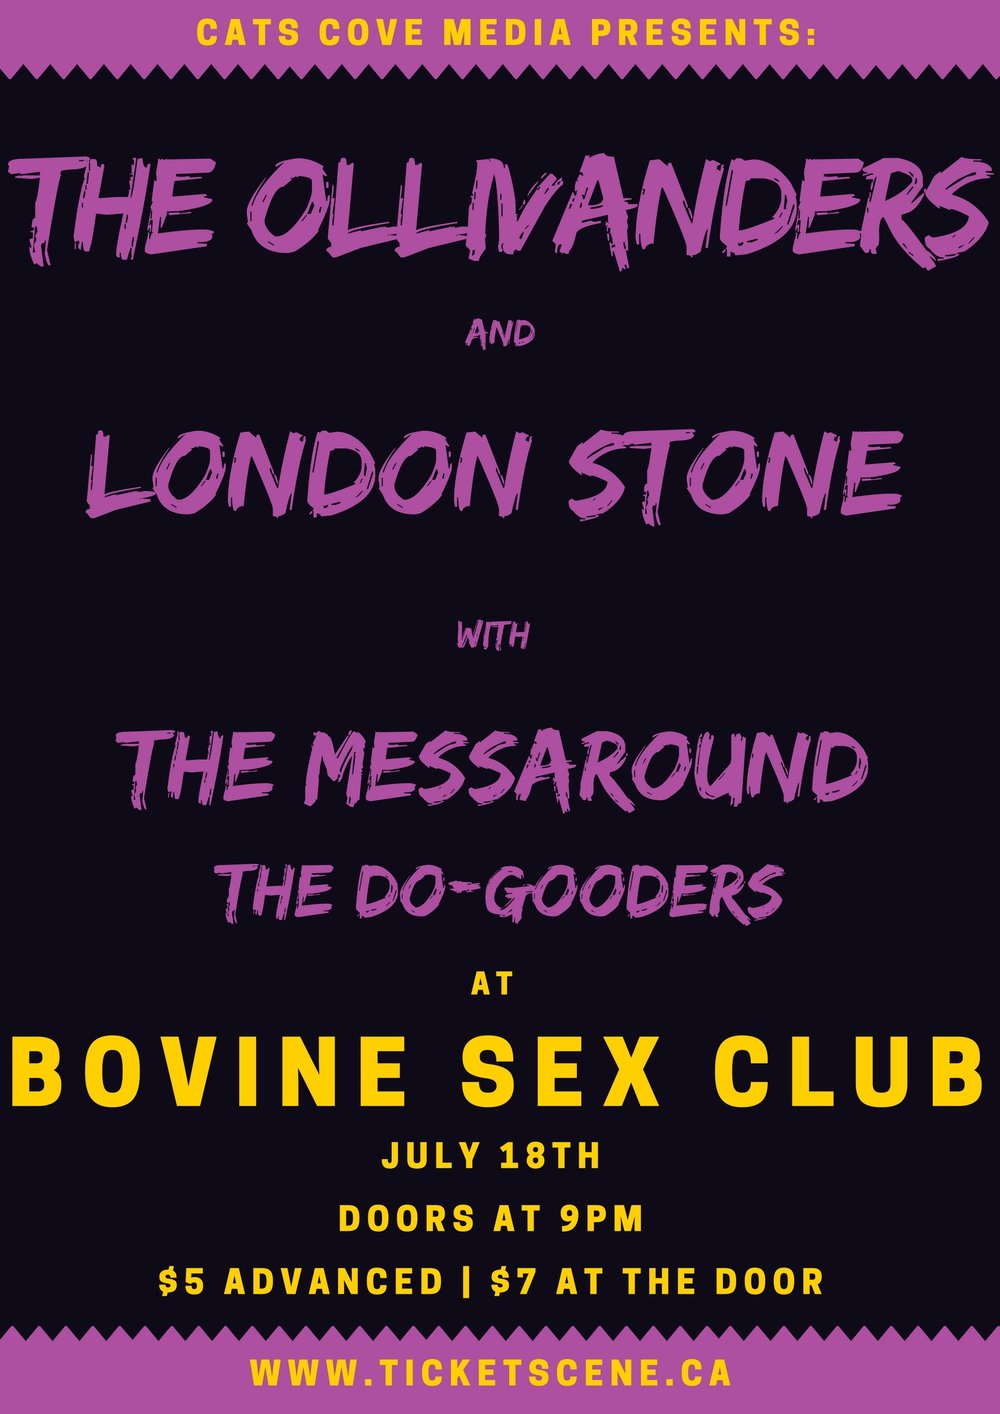 Bovine Sex Club.jpg